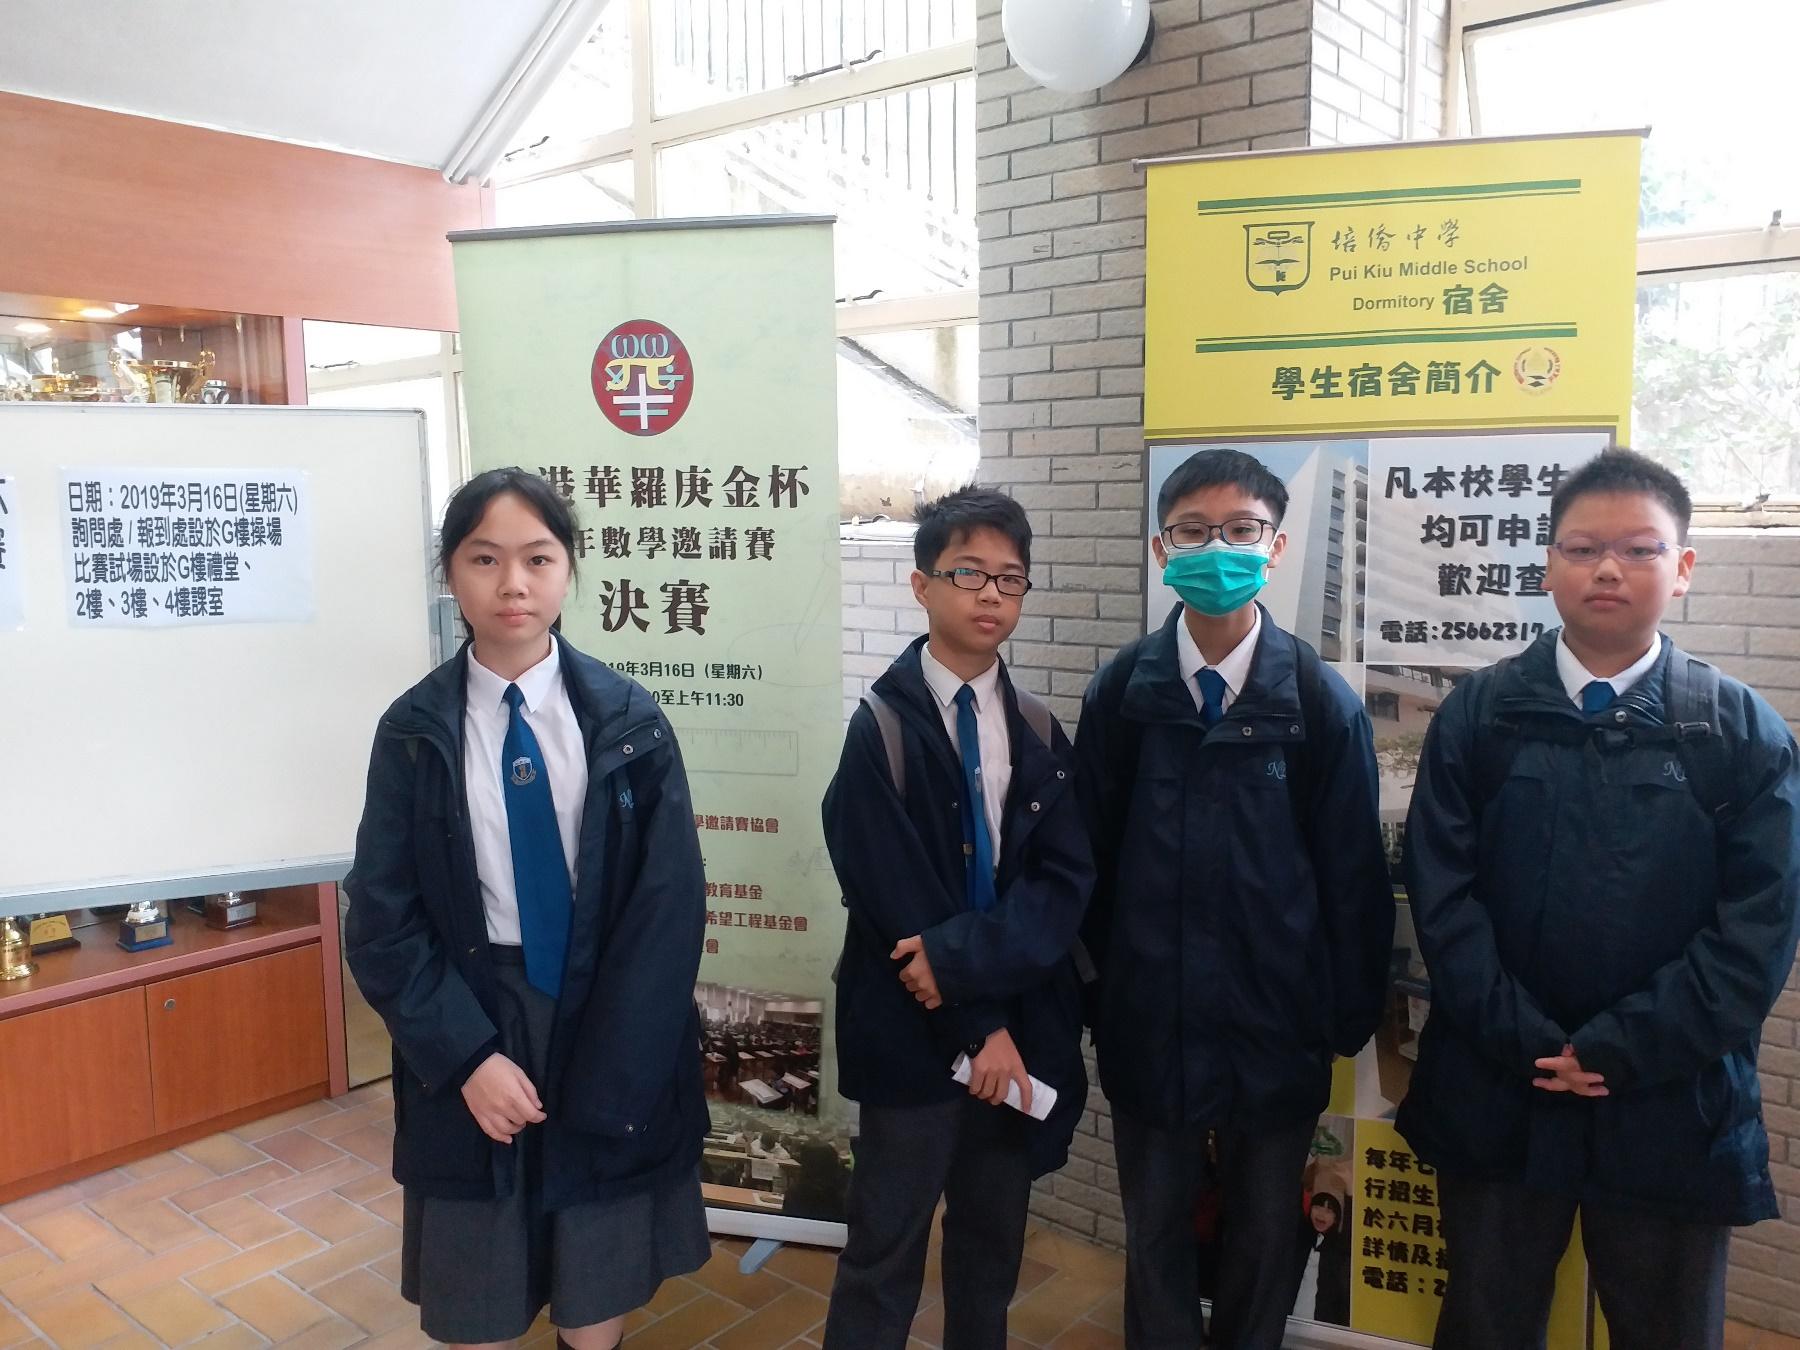 http://npc.edu.hk/sites/default/files/20190316_083946.jpg